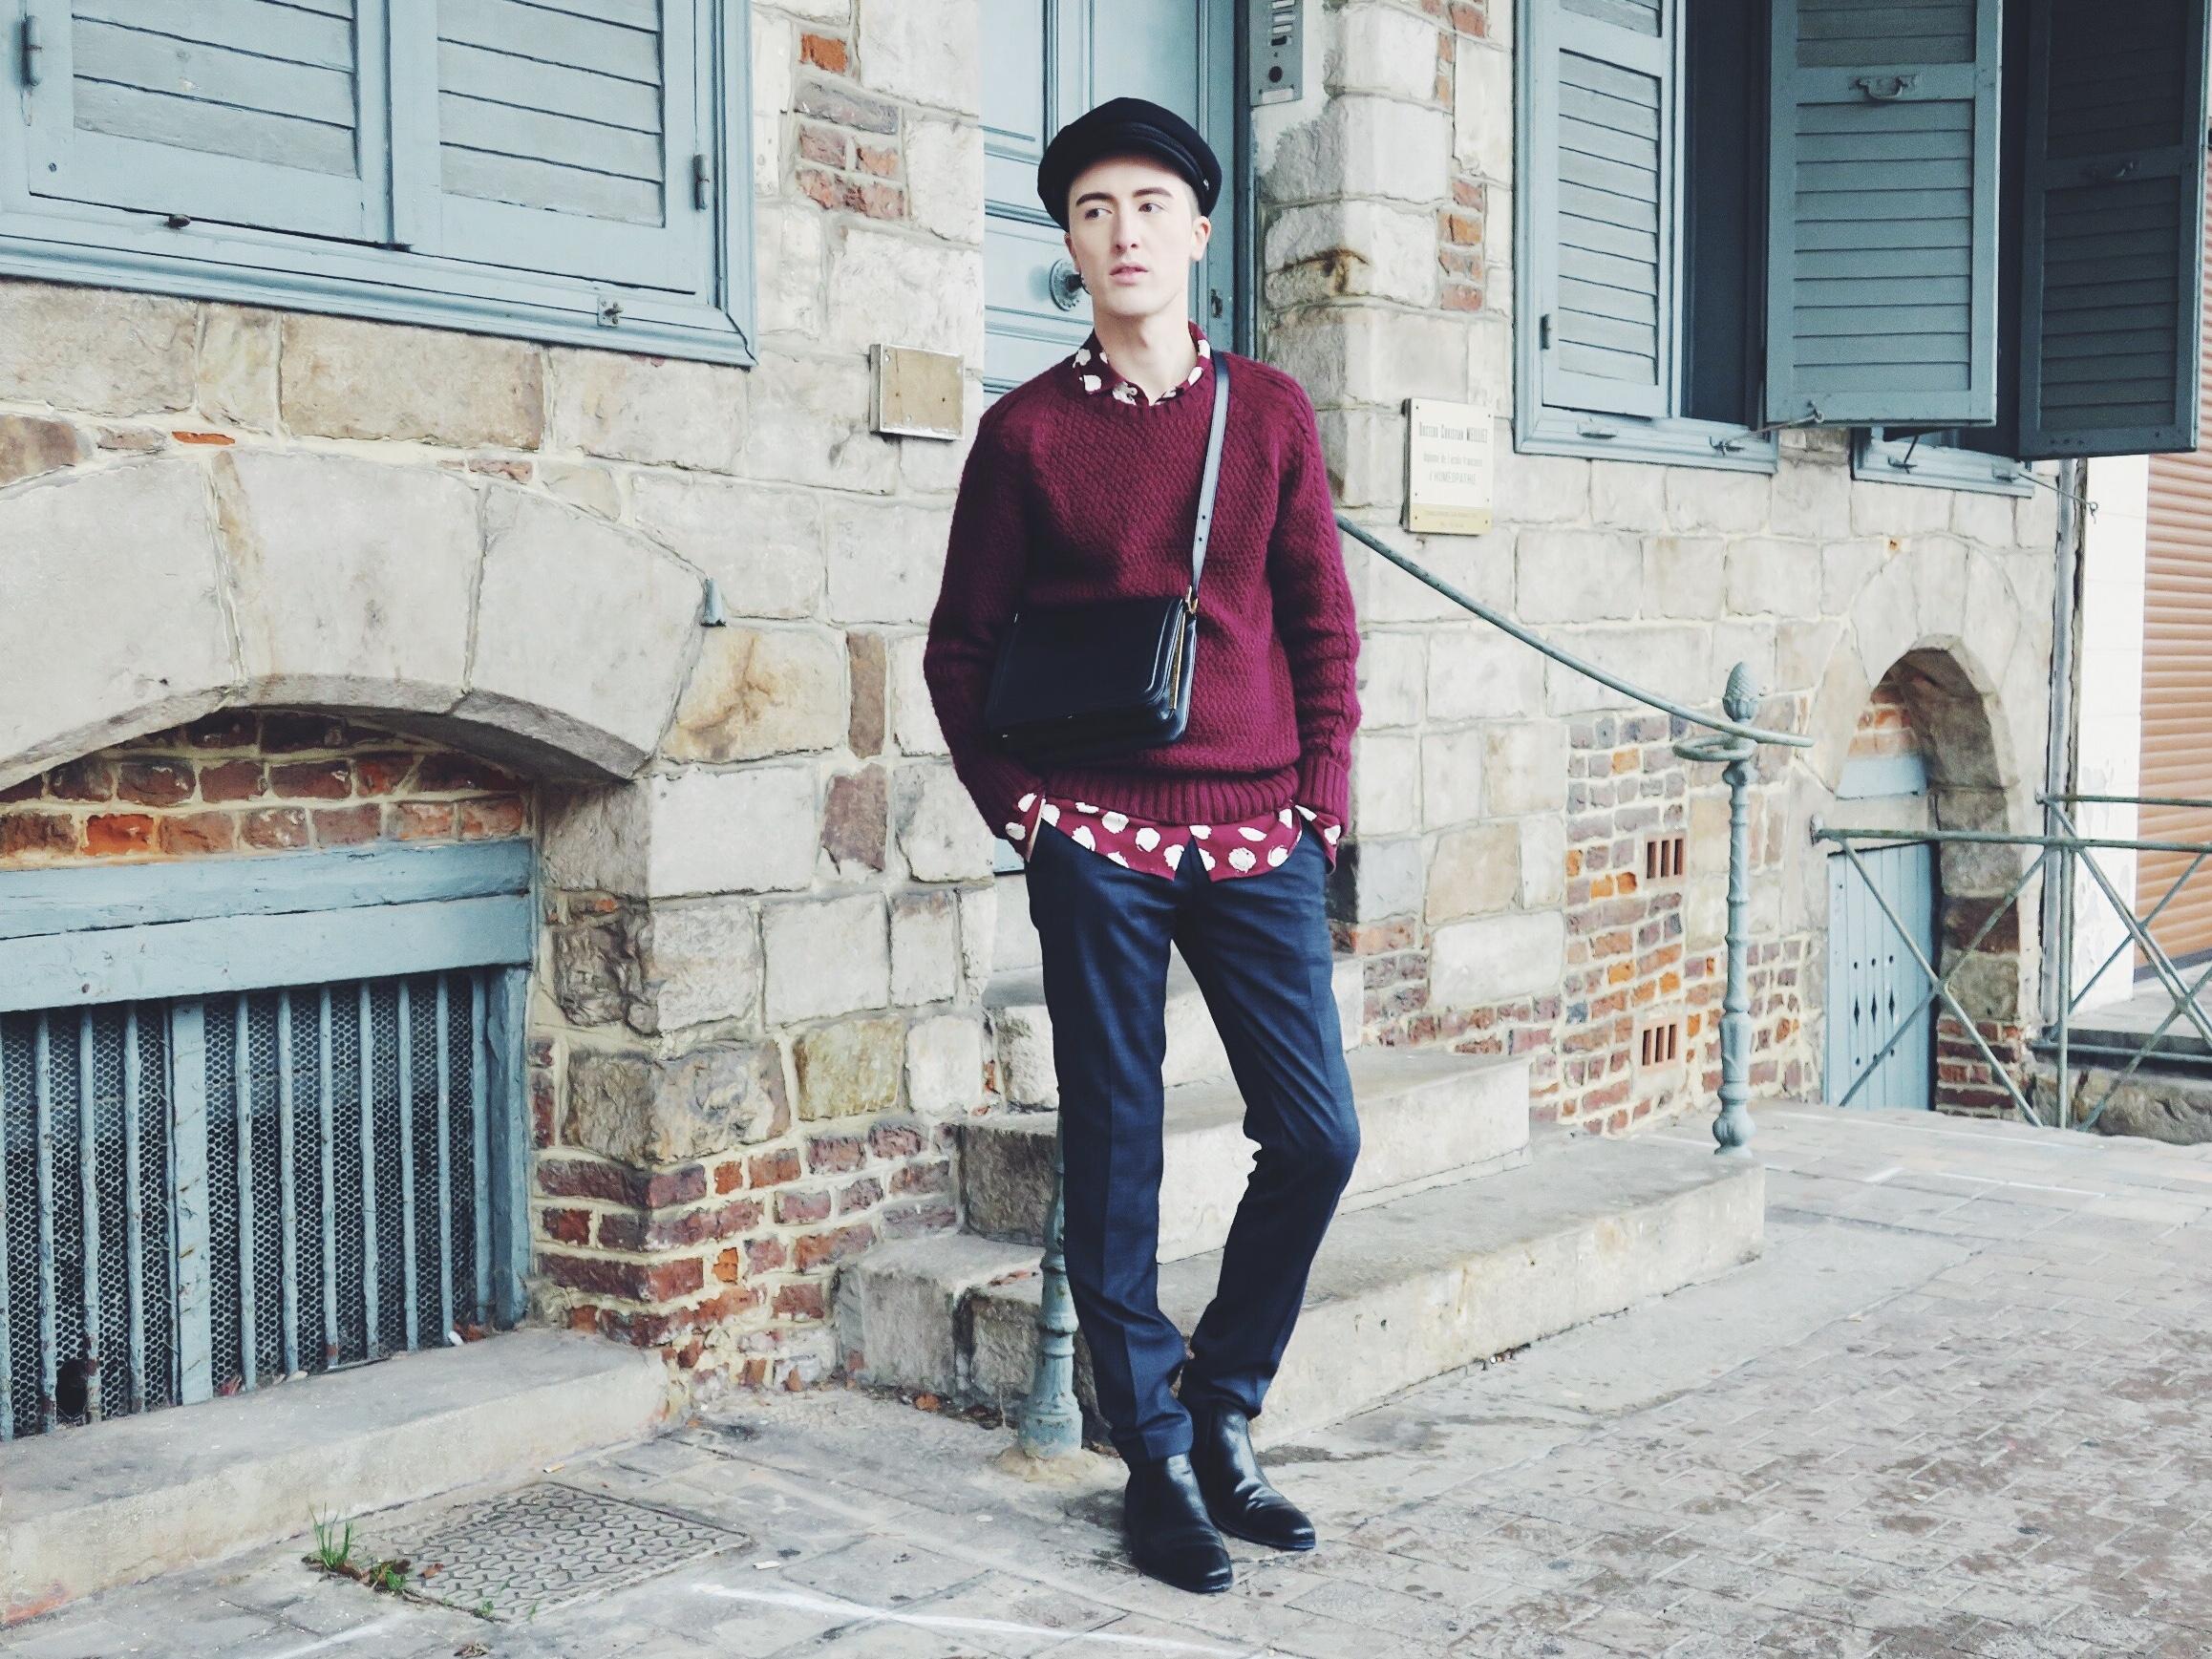 ASOS Design hat - Zara knitwear - Zara shirt - DIGEL move trousers - DIGEL move ankle boots - Delvaux bag